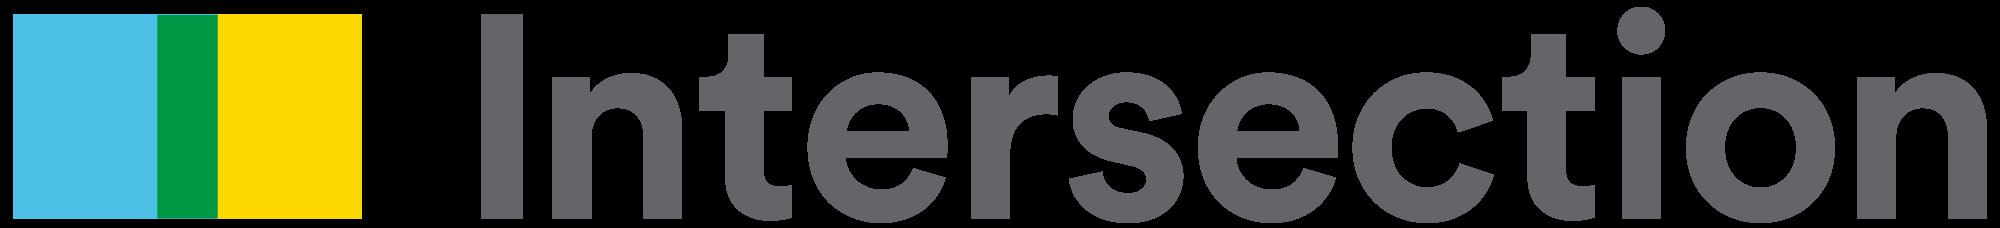 intersection logo grey